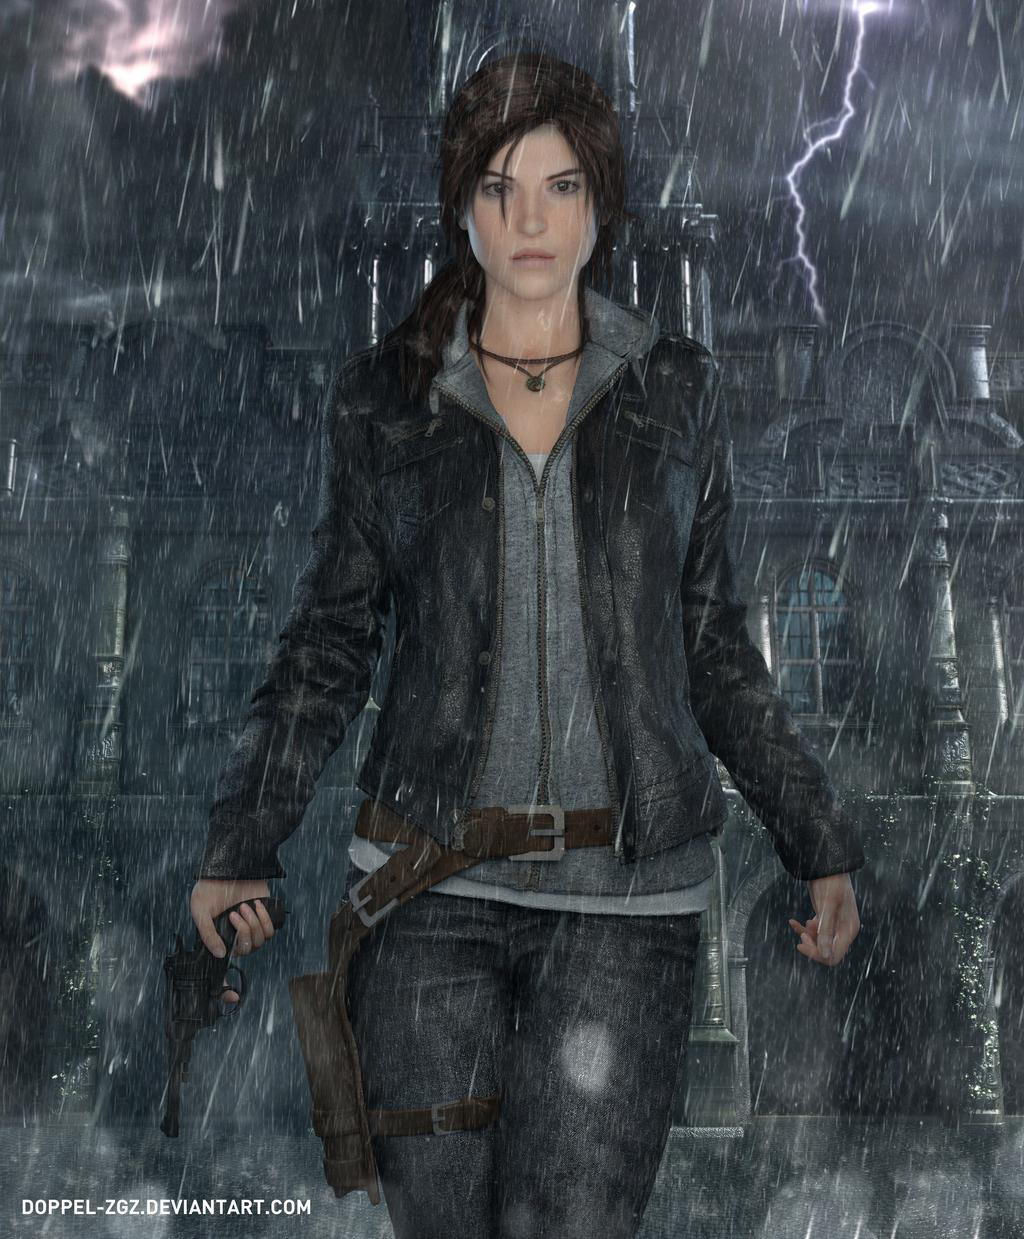 lara_s_nightmare_by_doppel_zgz_dajddls-fullview.jpg - Rise of the Tomb Raider